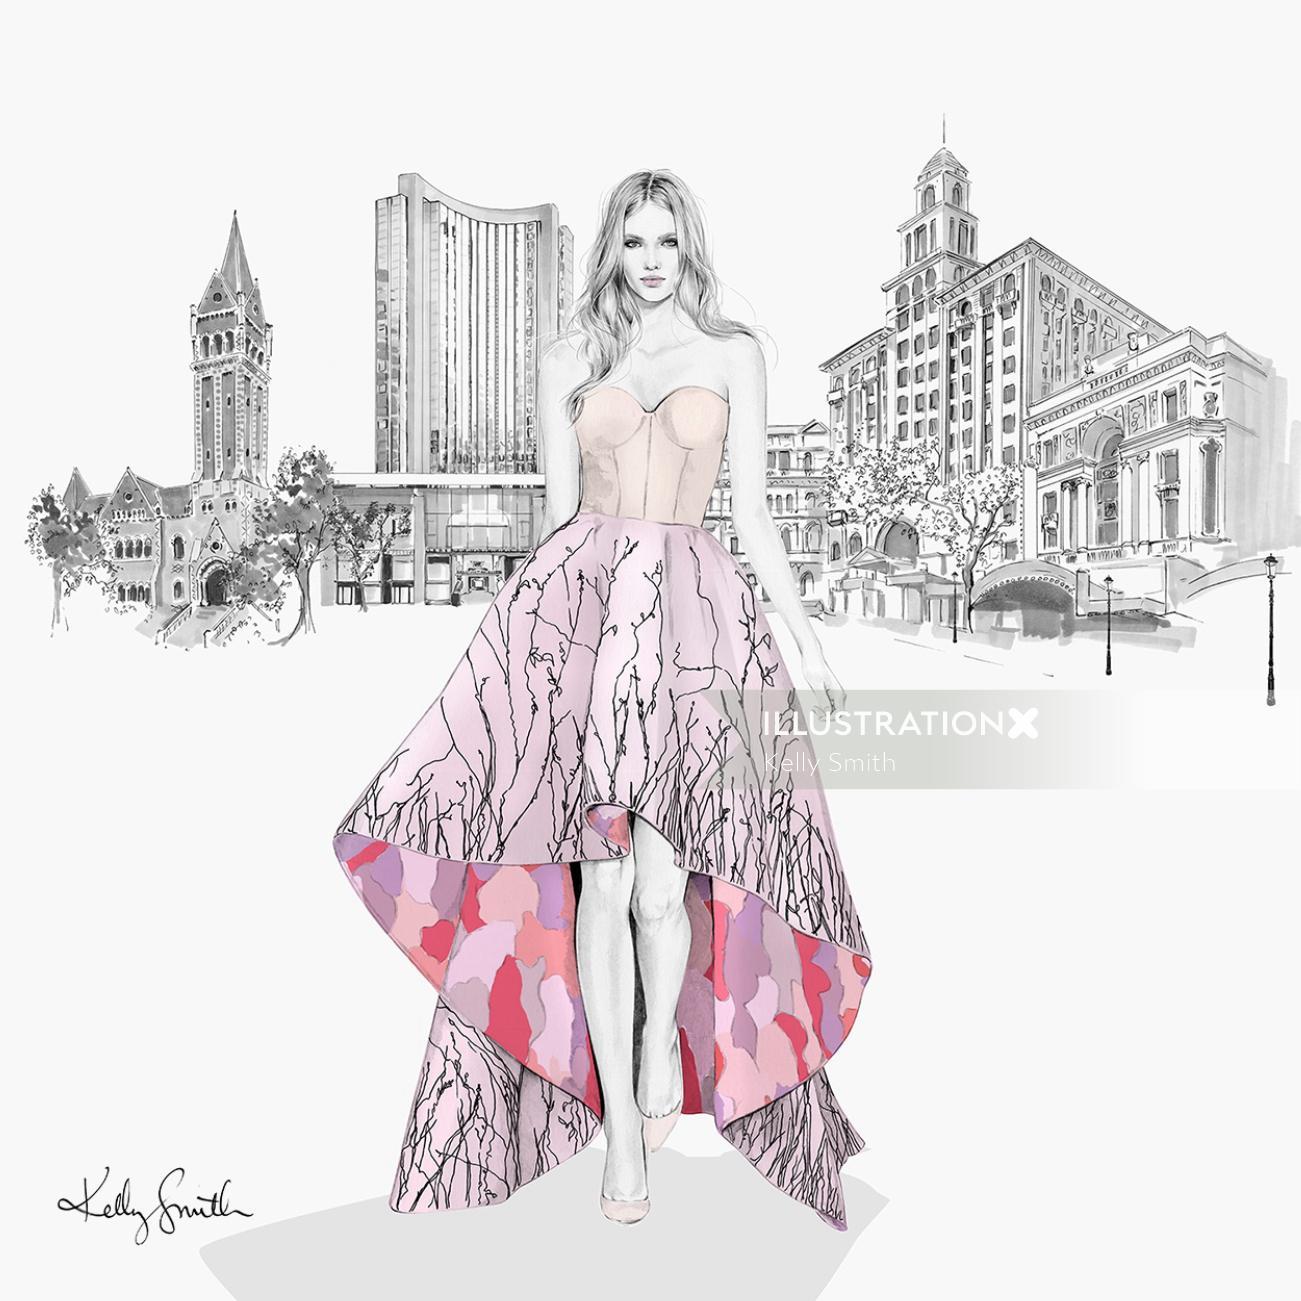 Lady fashion illustration for Grand Hyatt Melbourne hotel